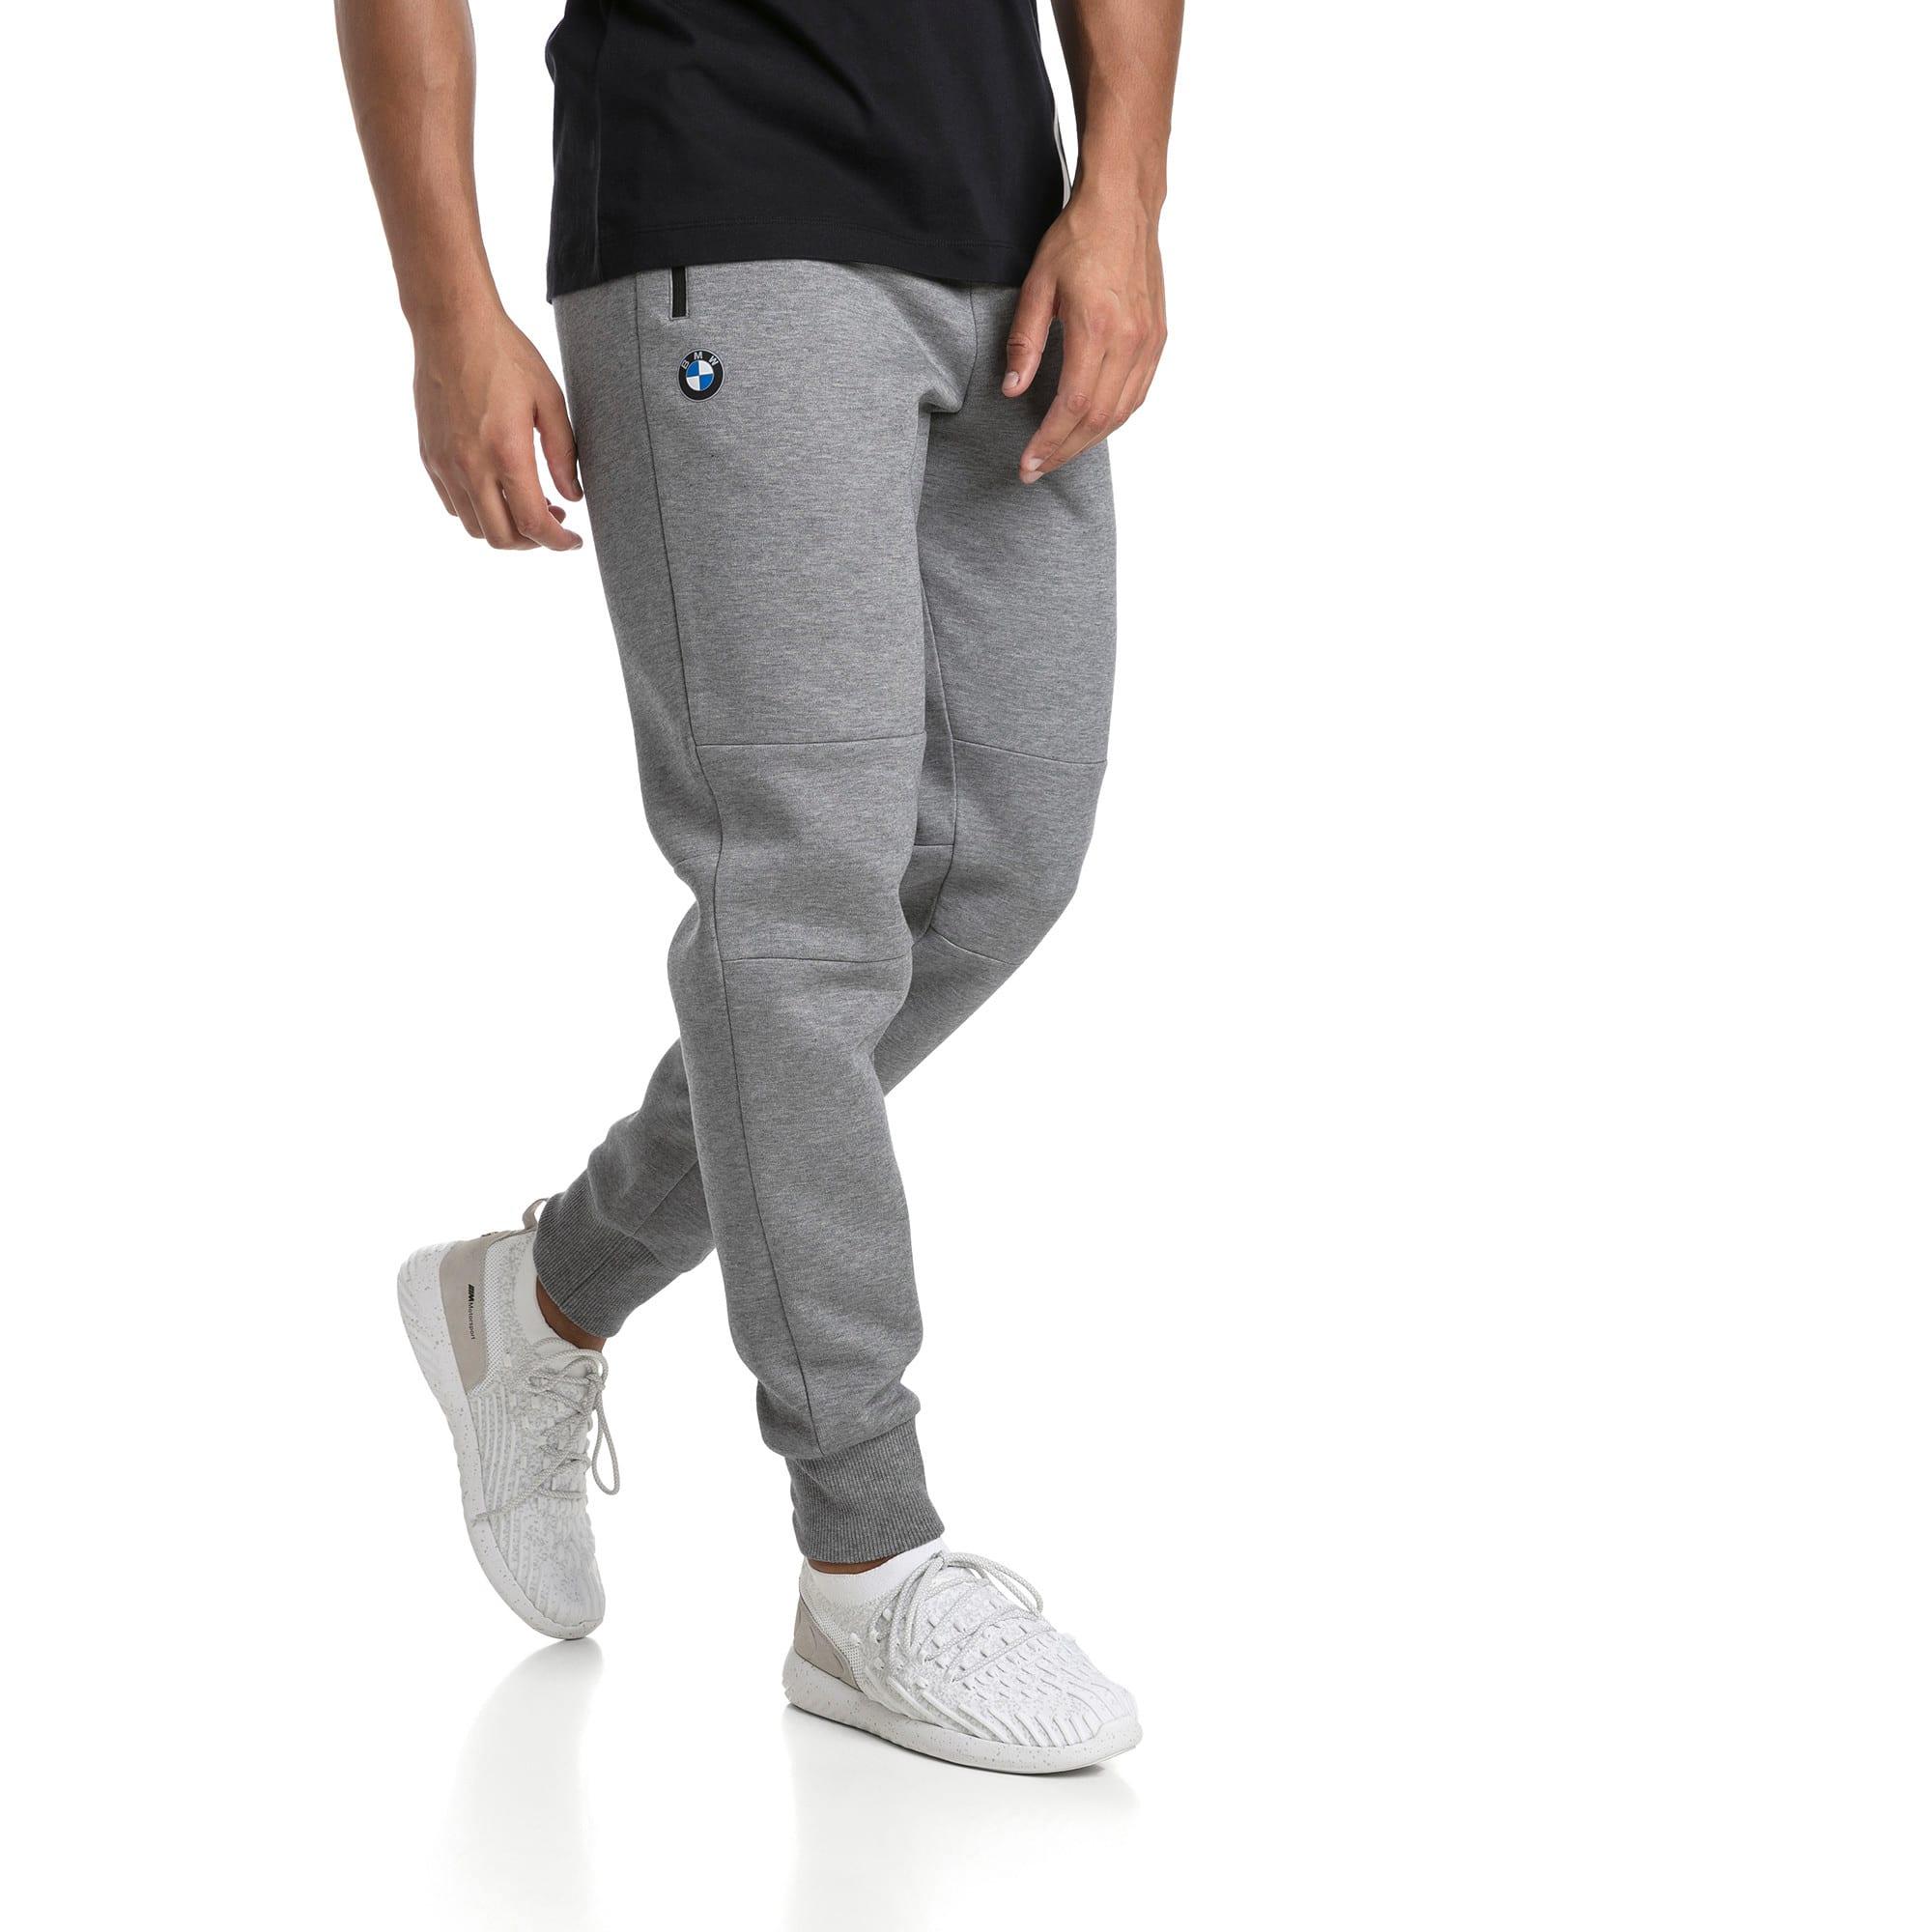 Thumbnail 2 of BMW Men's Sweatpants, Medium Gray Heather, medium